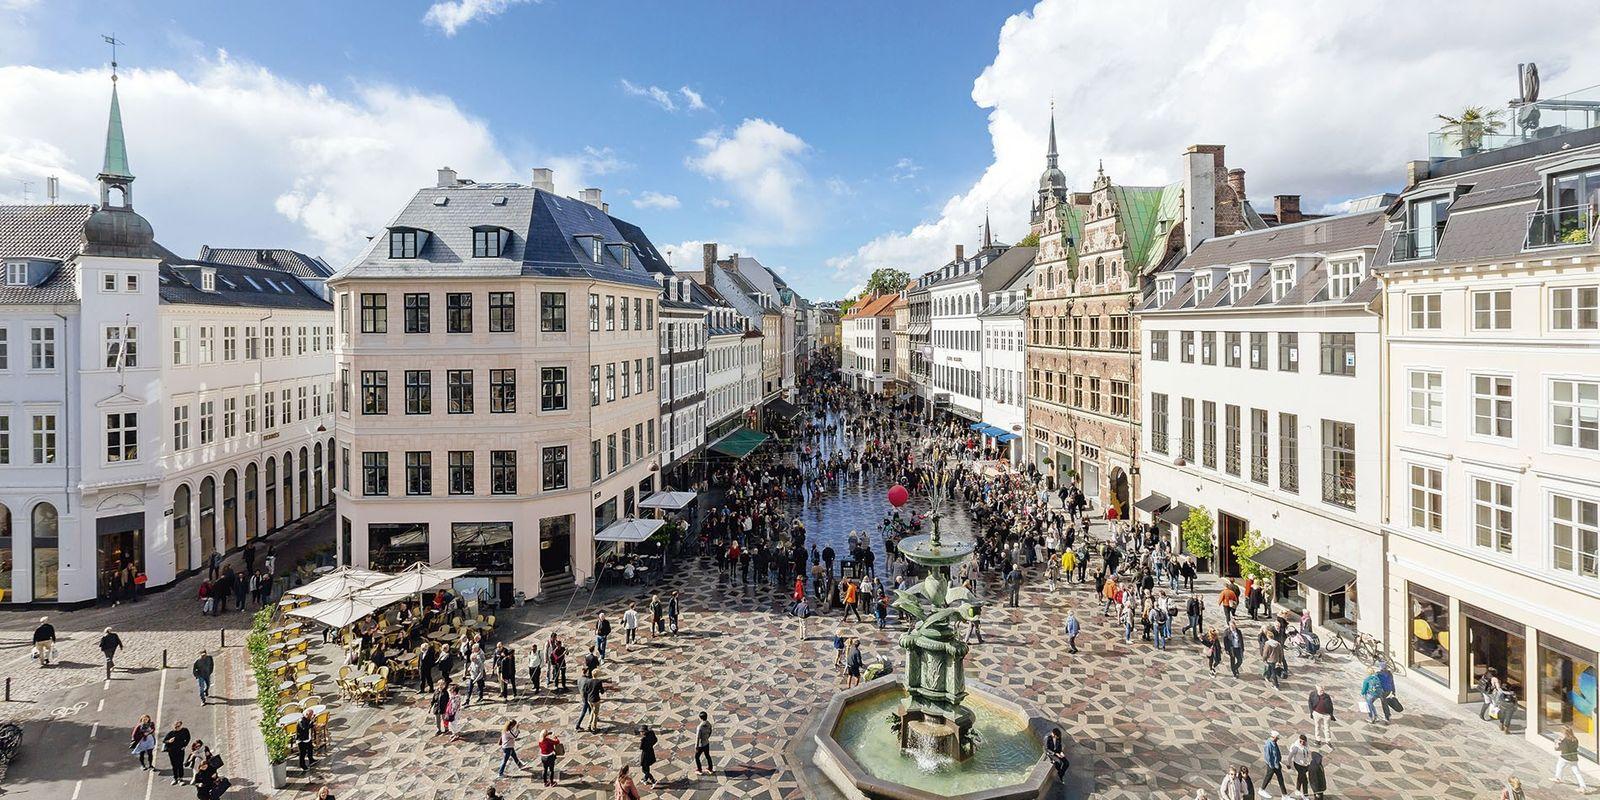 A culinary guide to Copenhagen